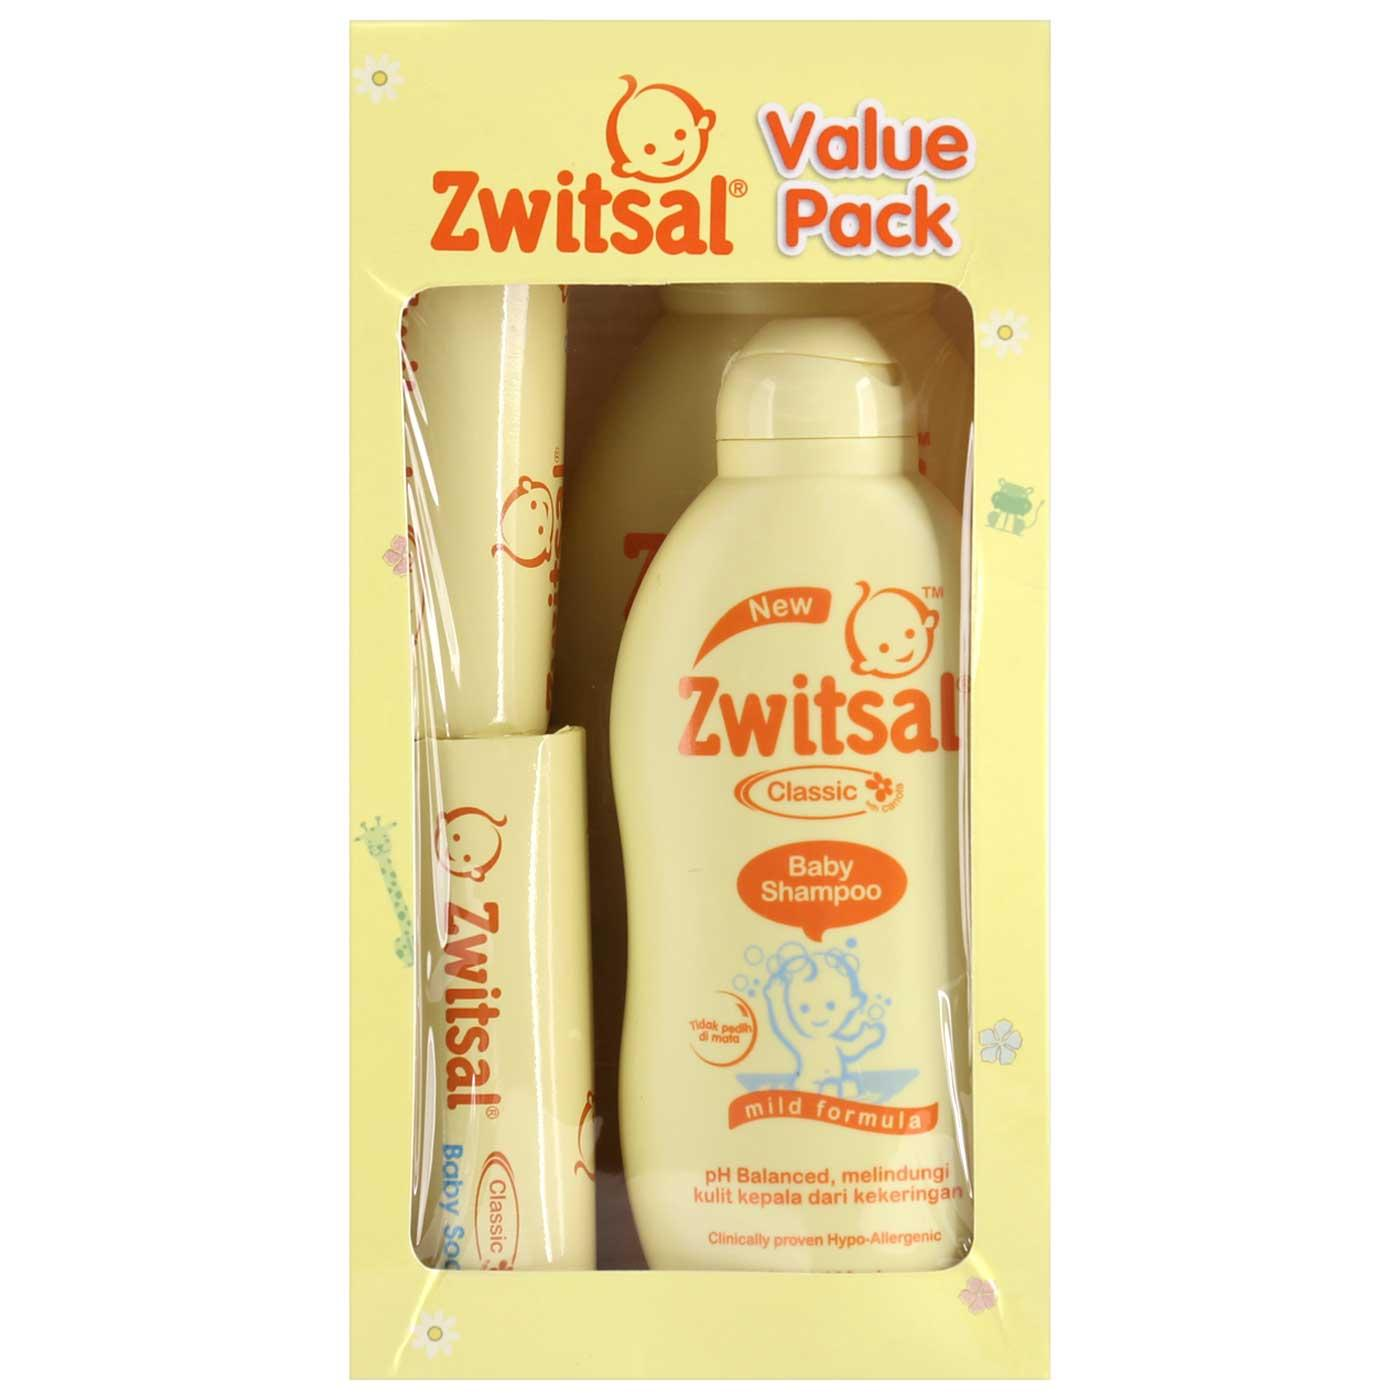 Penawaran Zwitsal Baby Value Pack Toko Perlengkapan Bayi Dan Ibu Hamil Twin Guard Lotion Tube 100 Ml